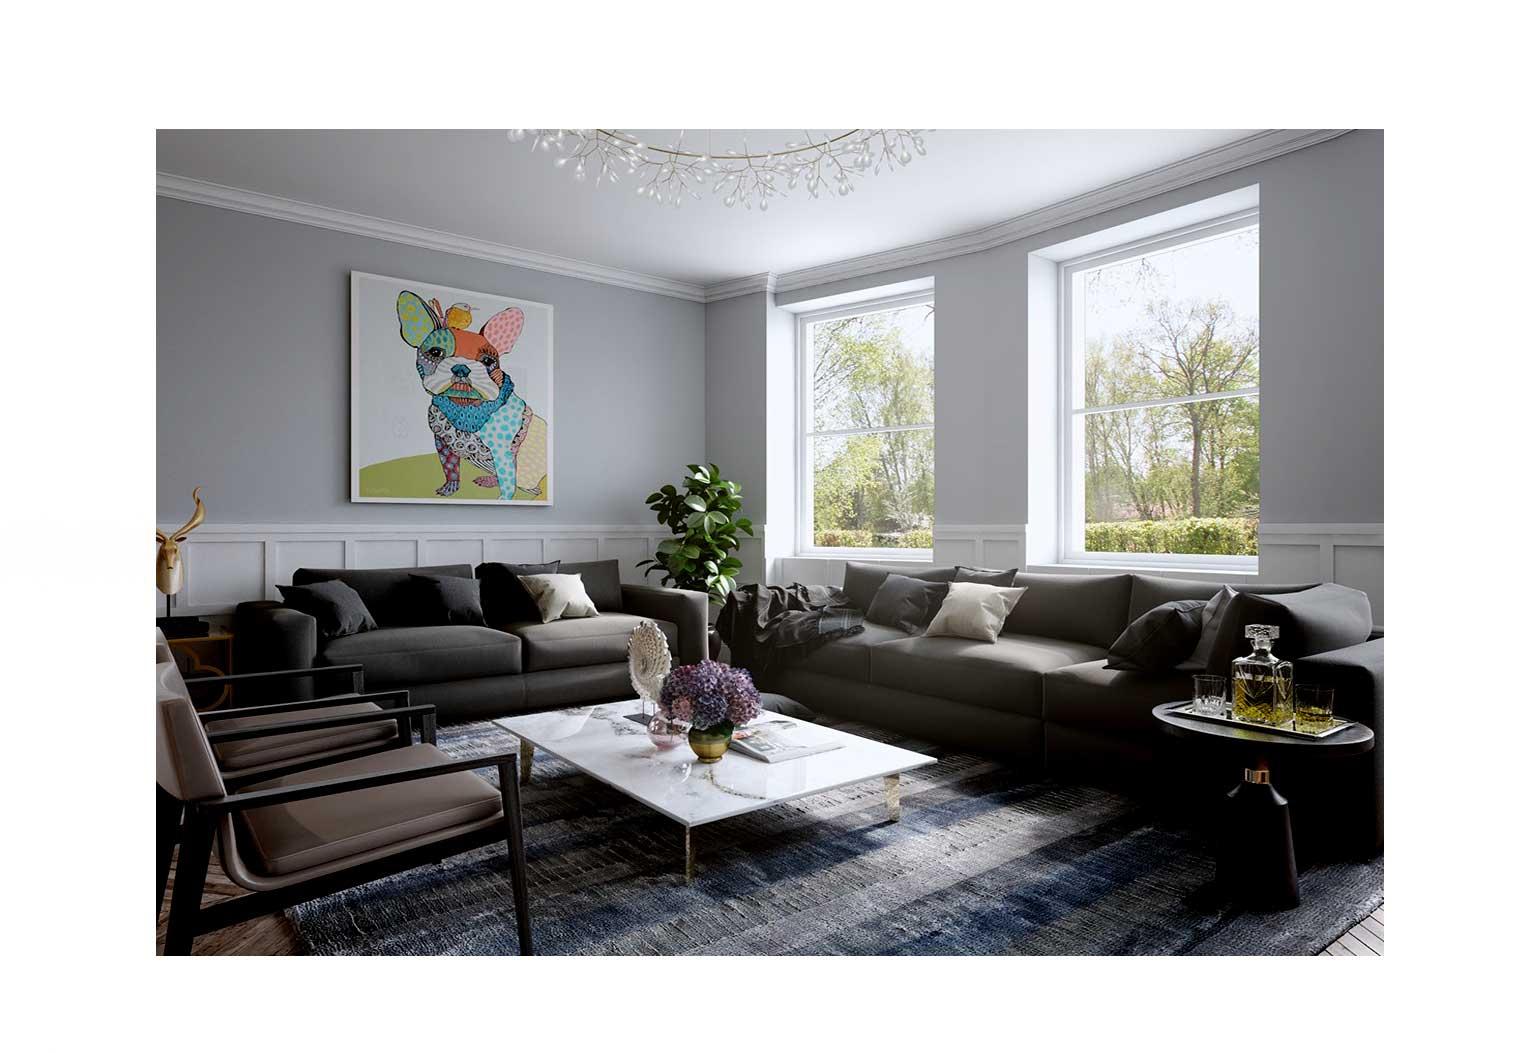 Design An Art centric Room08jpg - چگونه یک اتاق هنری را طراحی کنیم؟